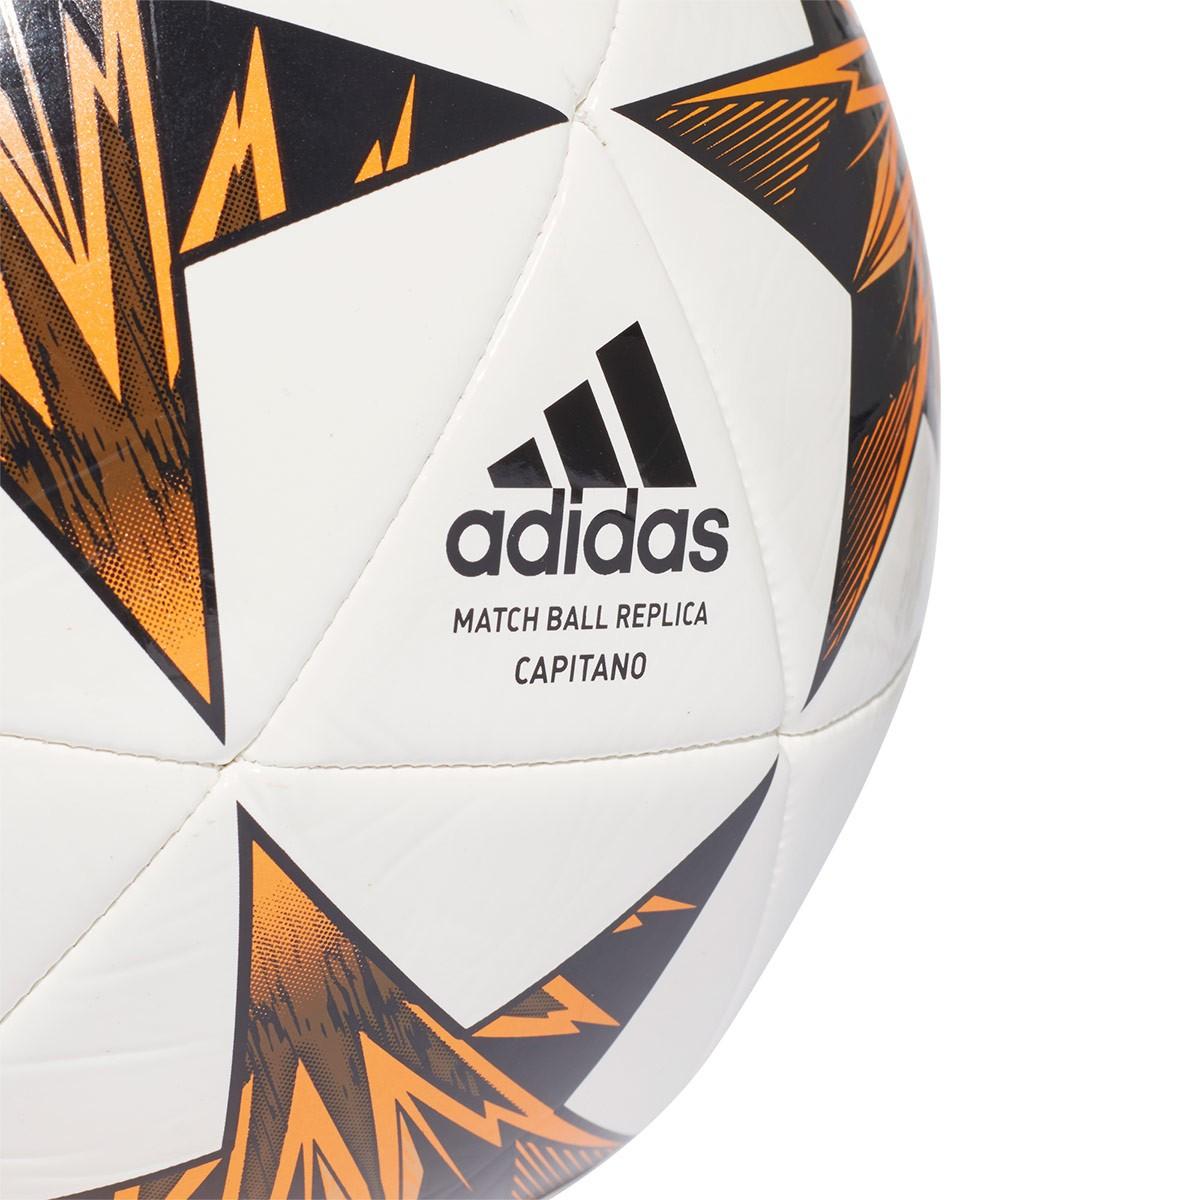 c2acc695d840e Bola de Futebol adidas Finale Kiev Capitano White-Black-Trace olive-Core  black-Bright ora - Loja de futebol Fútbol Emotion